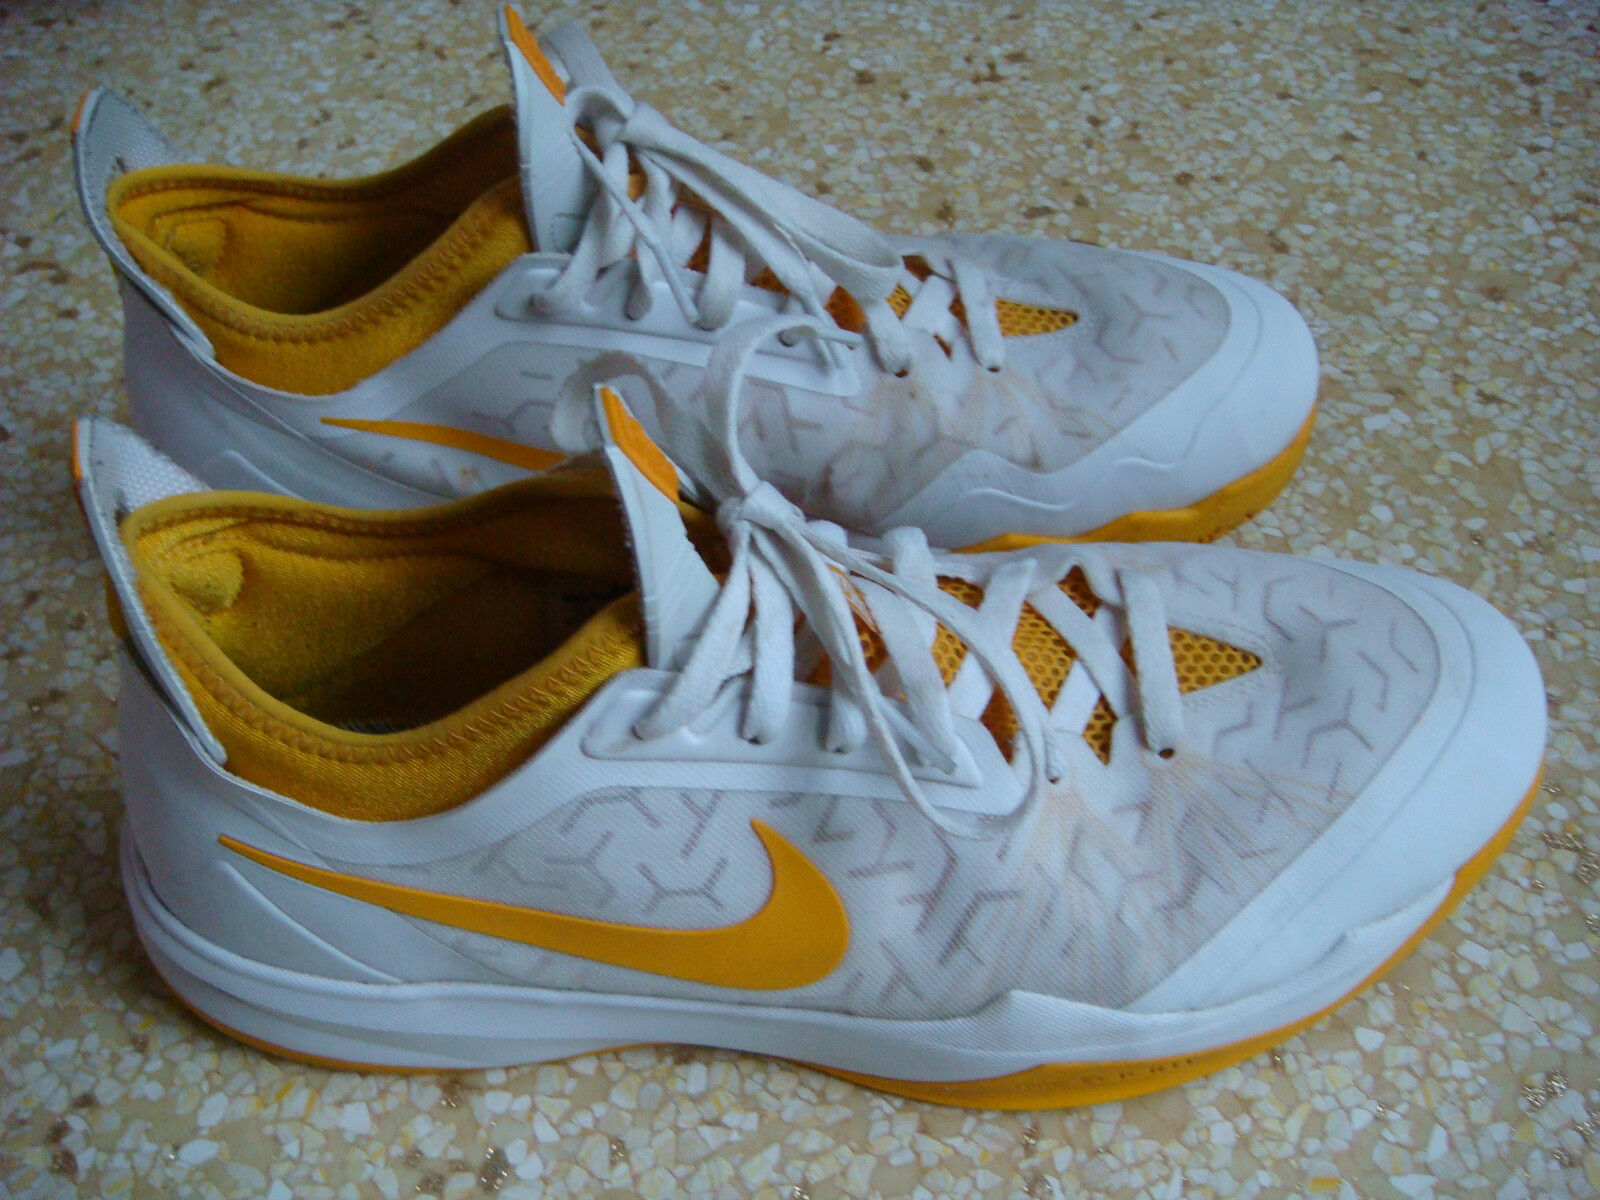 Nike zoom crociato giallo  white Uomo misura 12,5 scarpe da basket.